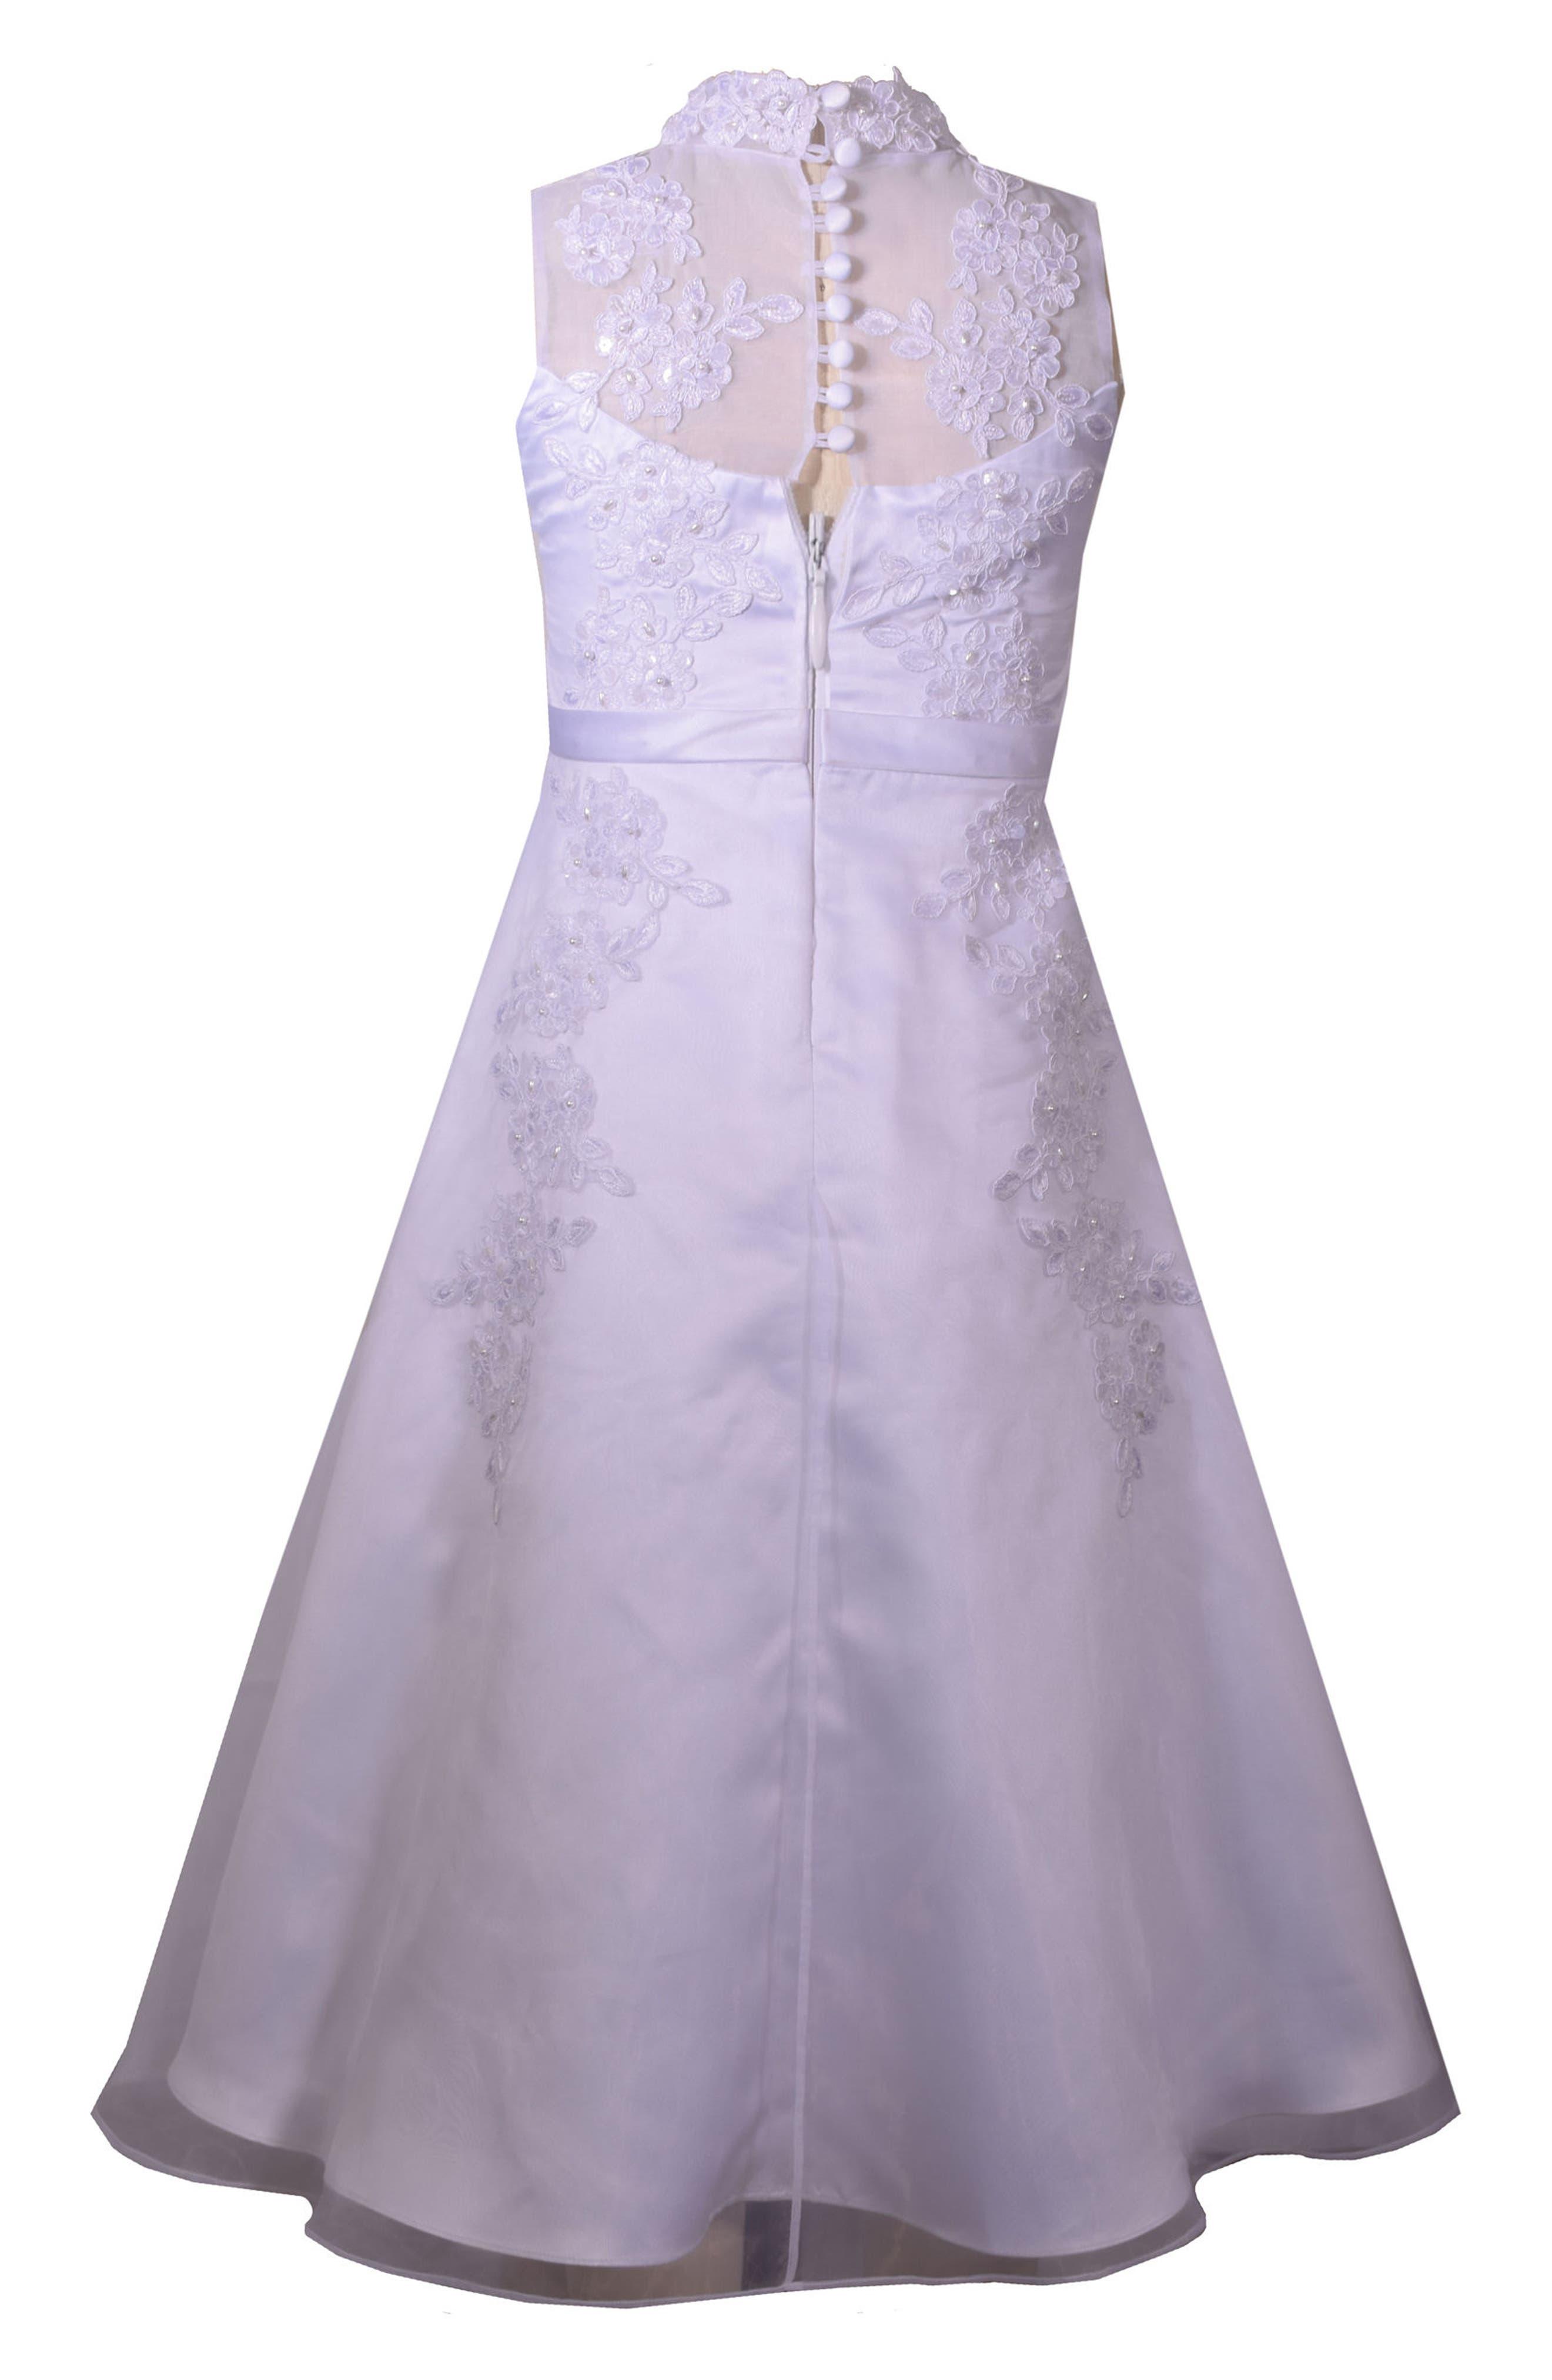 Sequin First Communion Dress,                             Alternate thumbnail 2, color,                             White